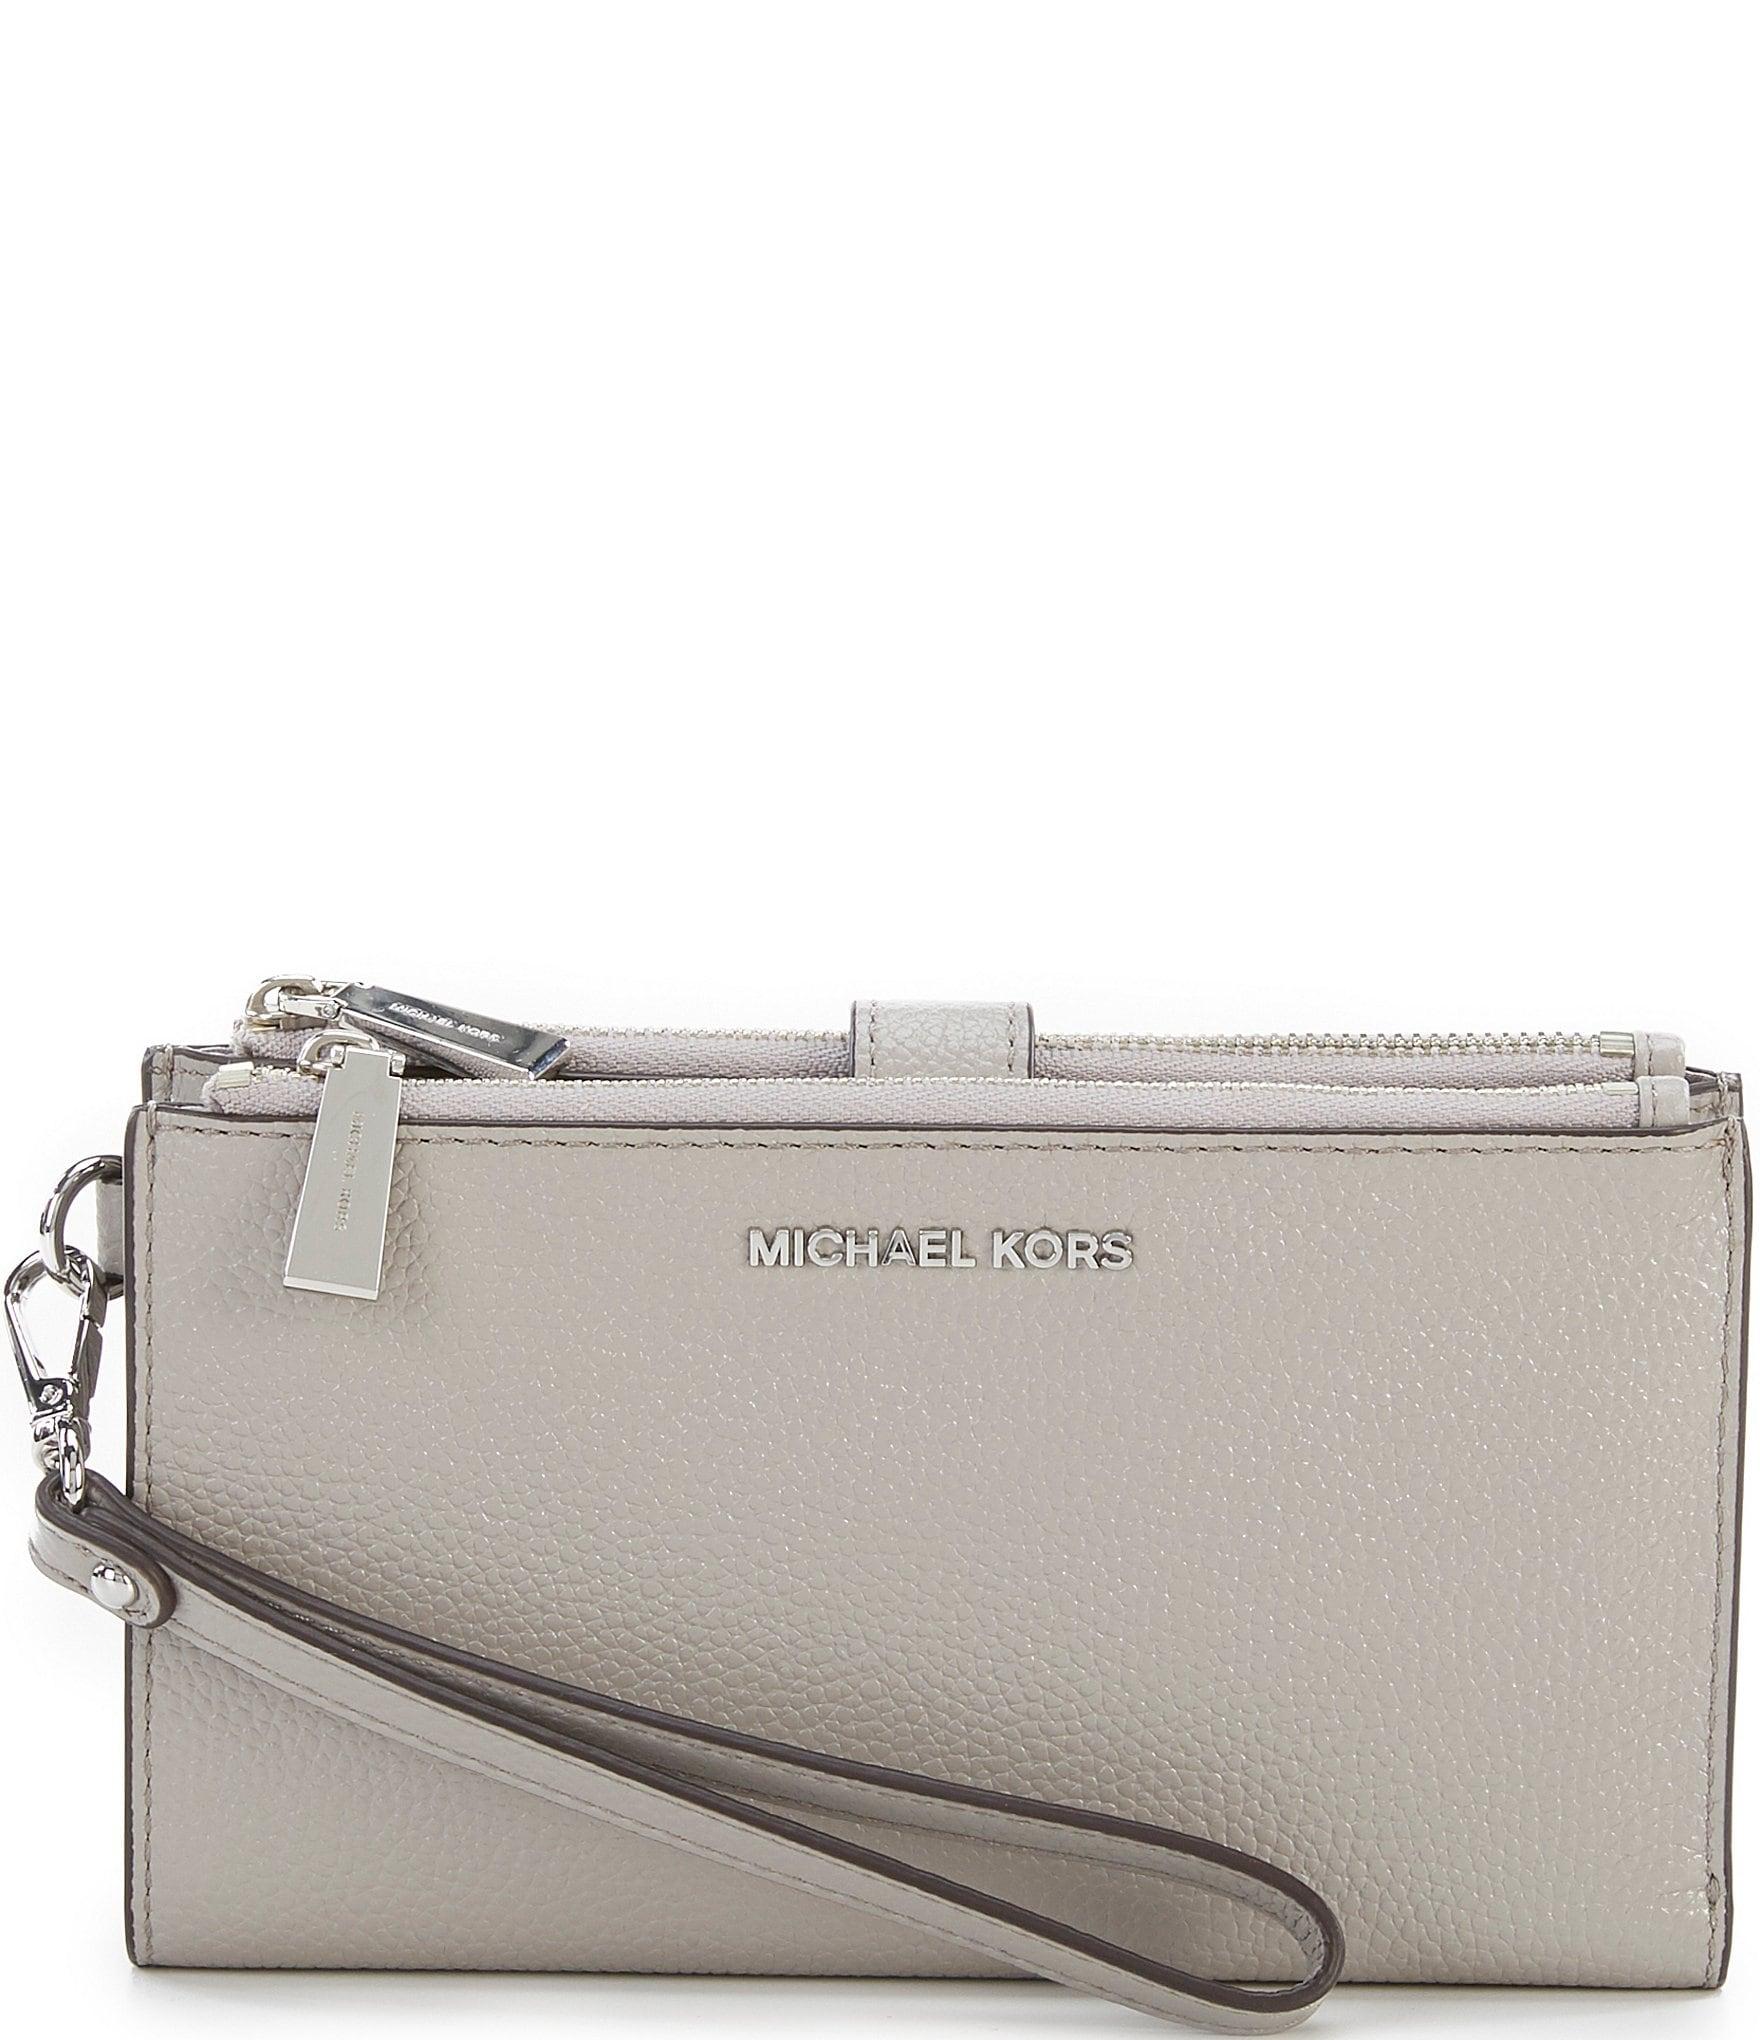 cbbd9ee64d673e Leather Wristlets | Dillard's